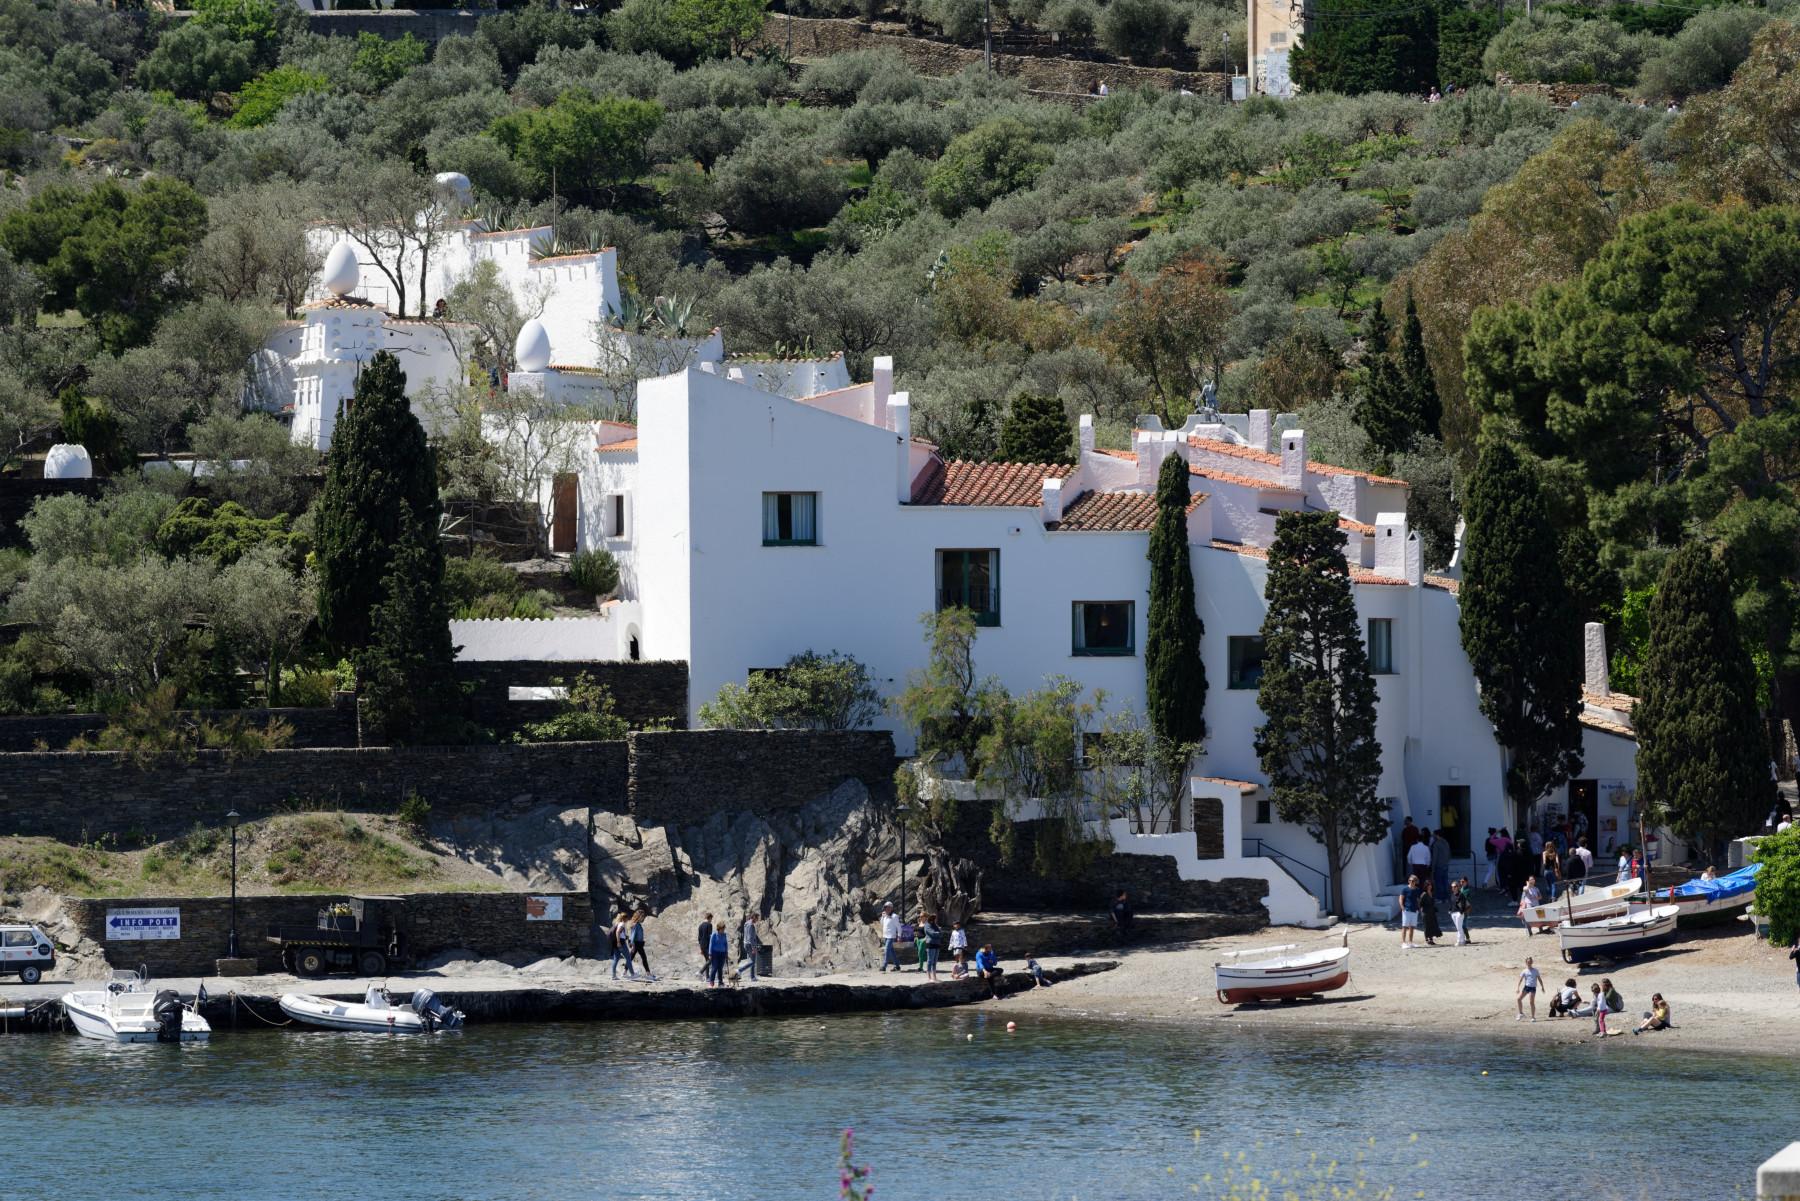 180430-2-Port lligat (10) (Catalogne)